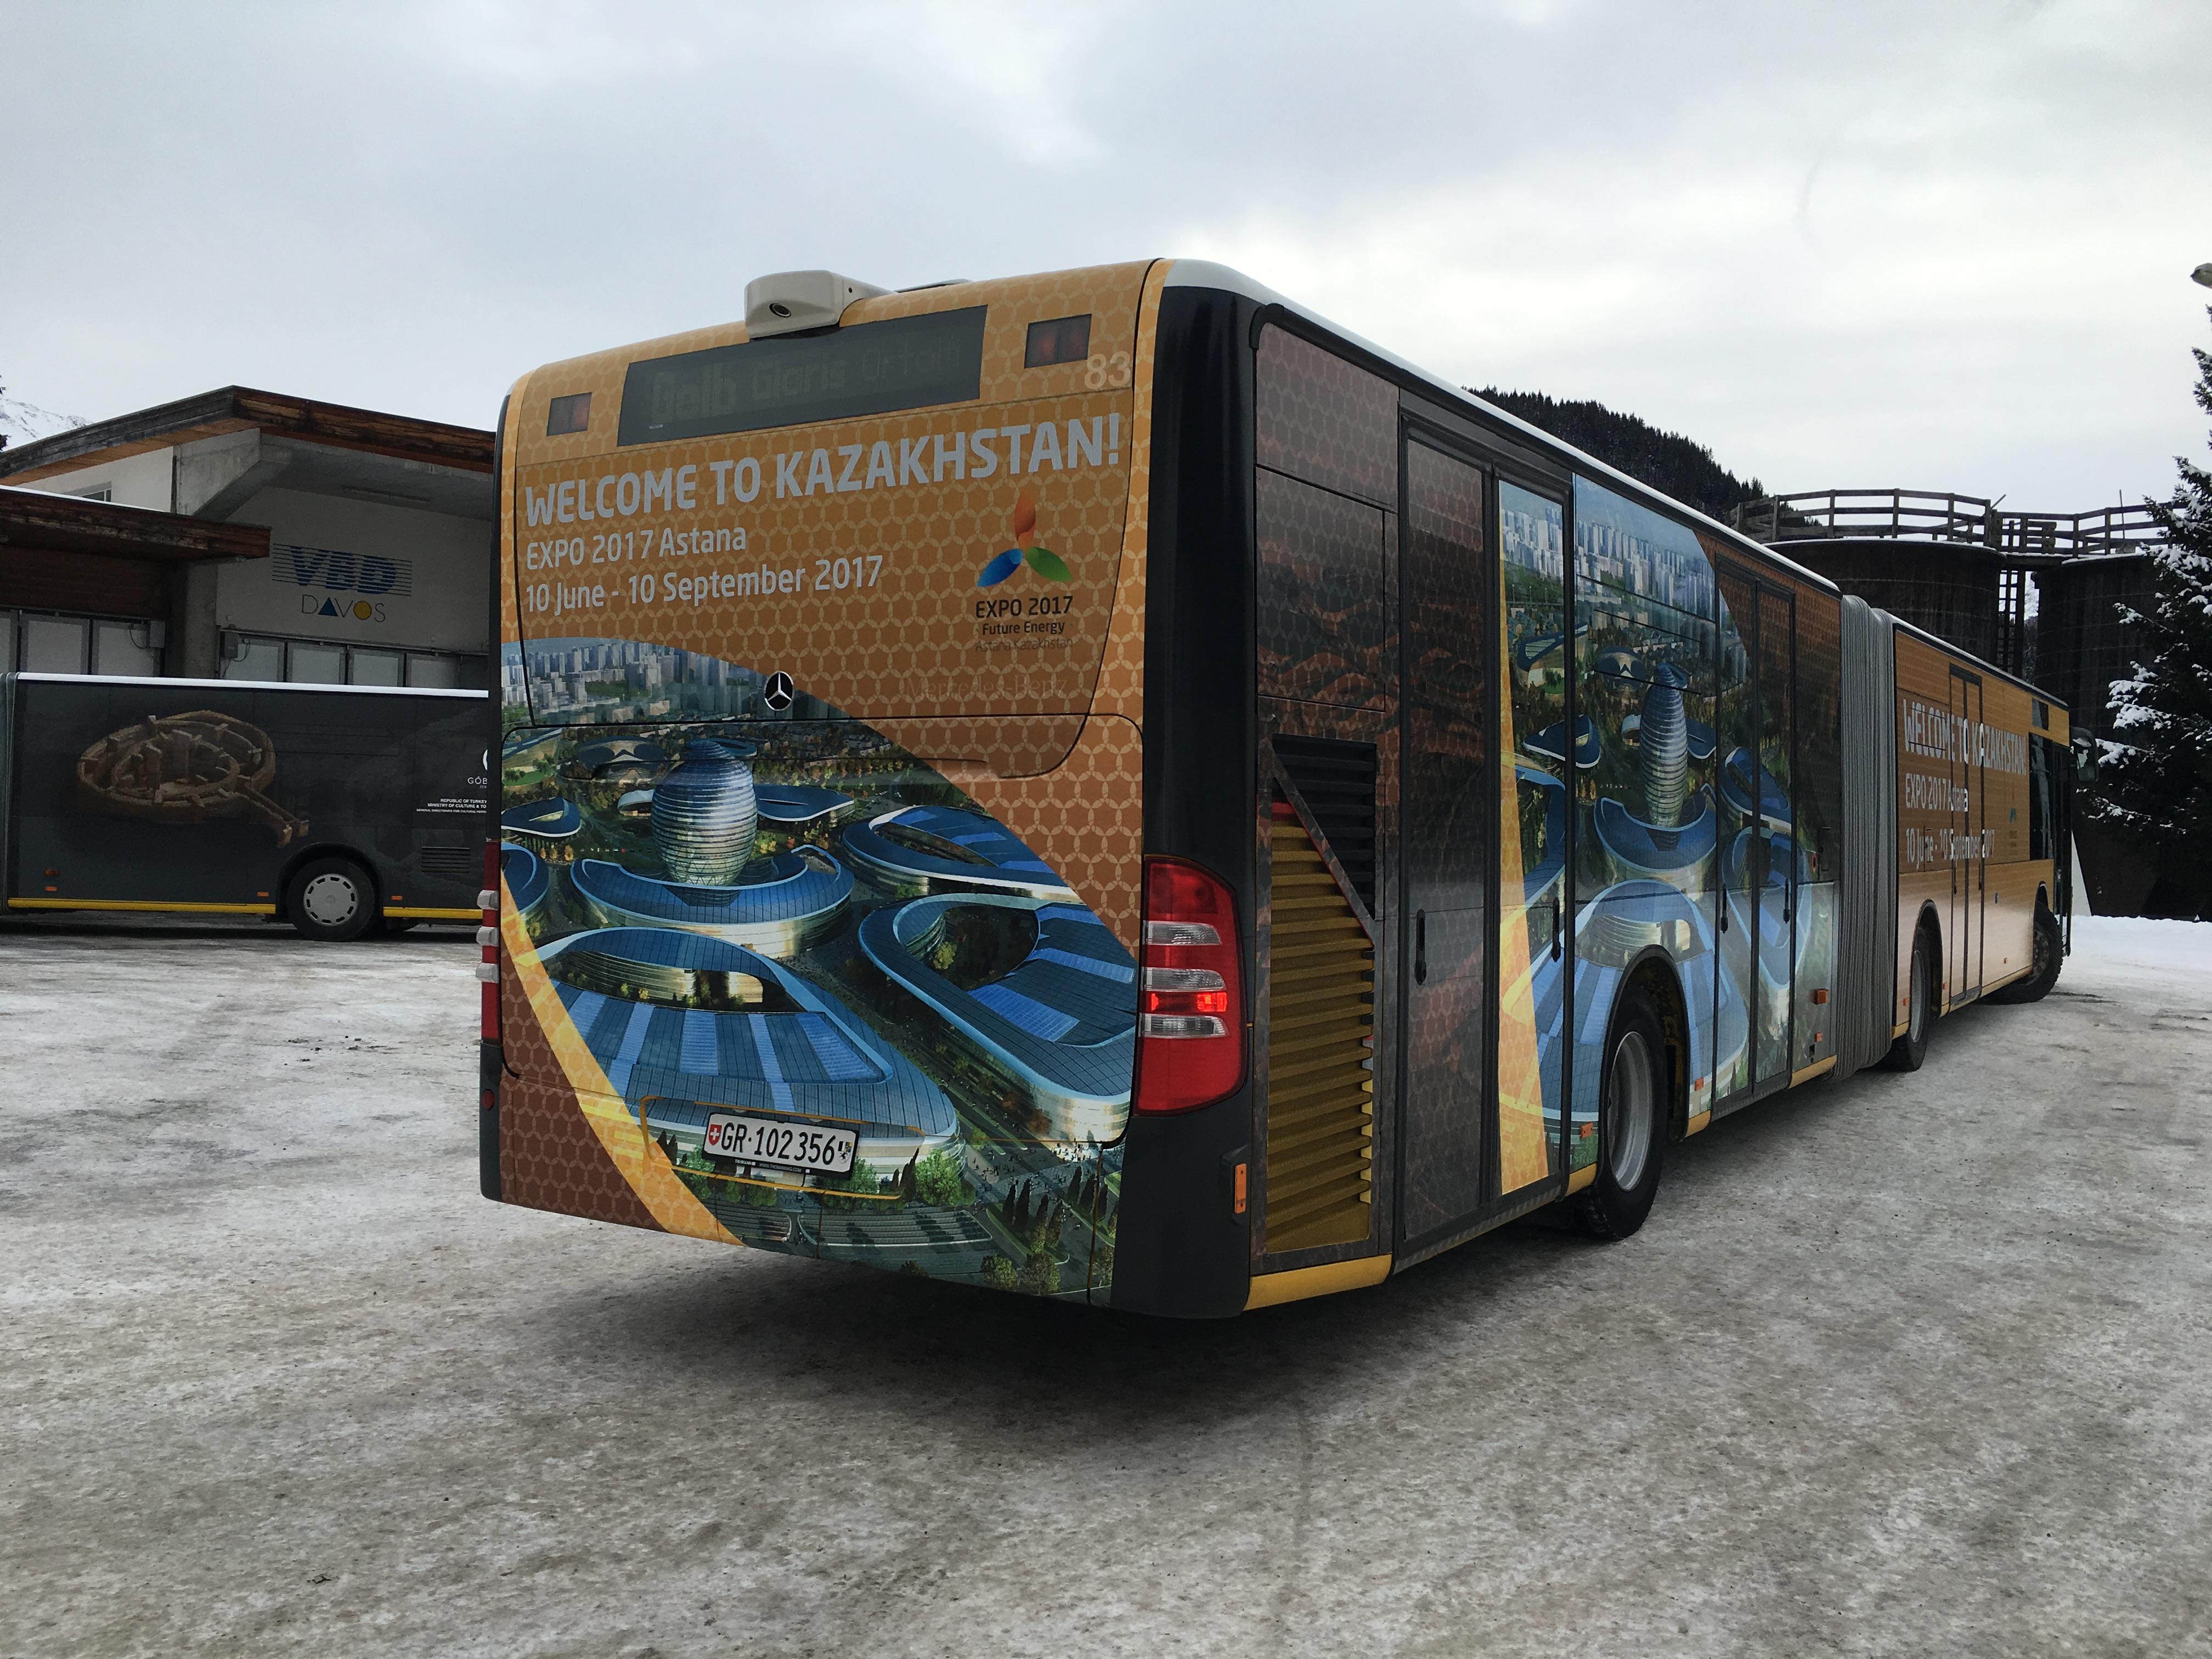 Wef Bus